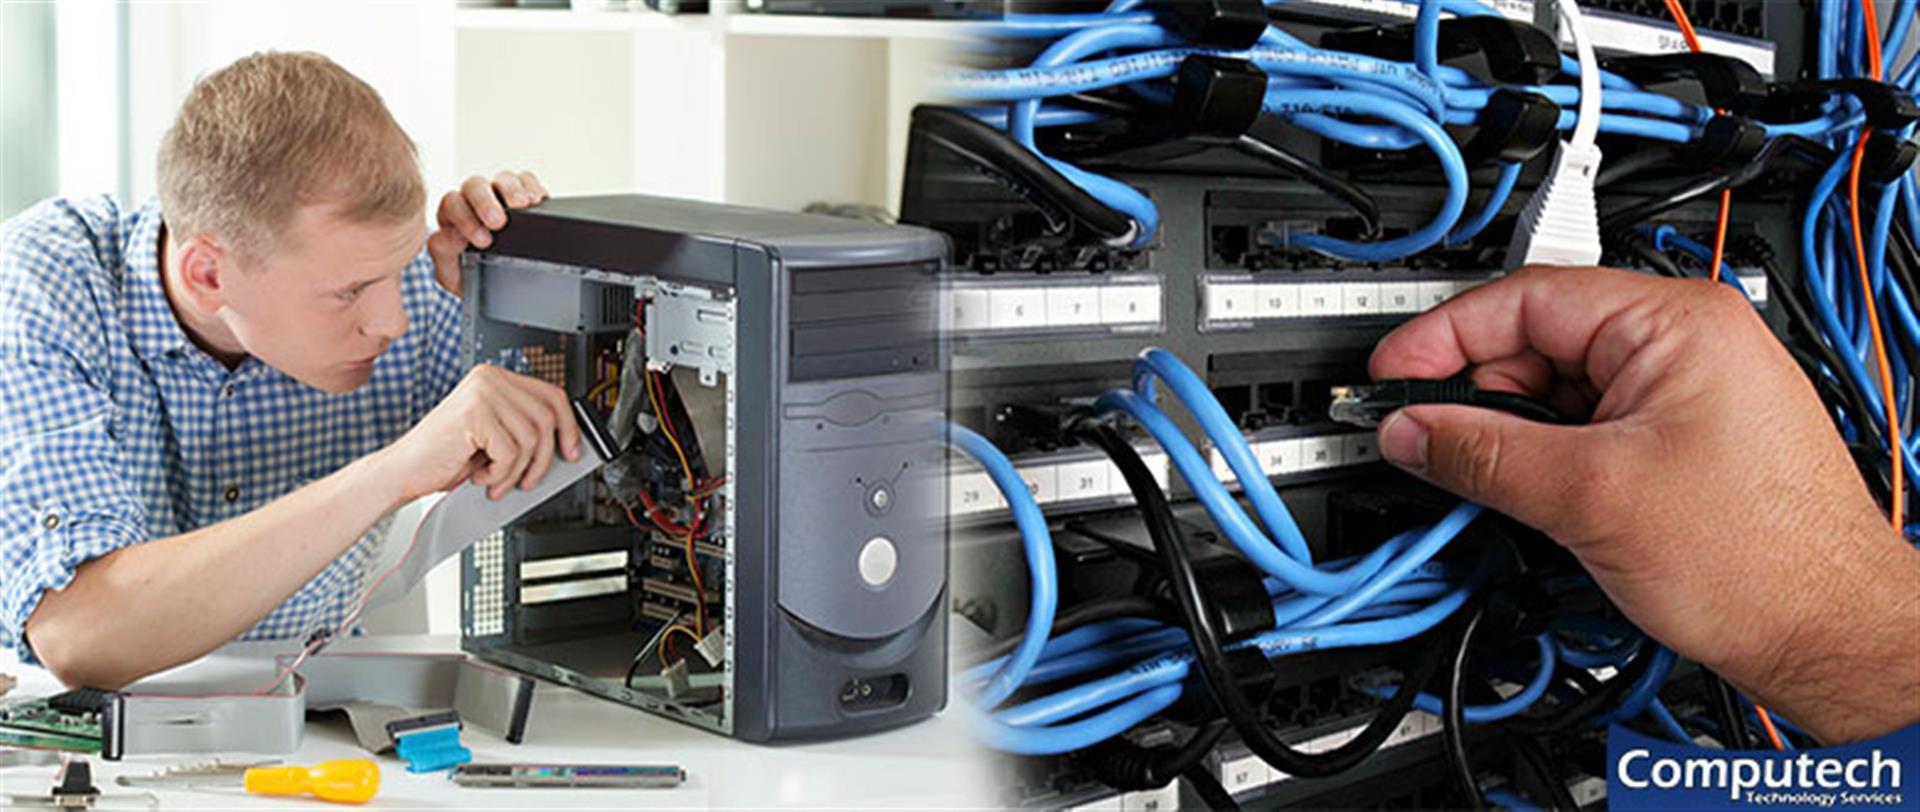 Madison Alabama Onsite Computer & Printer Repair, Network, Telecom & Data Wiring Solutions